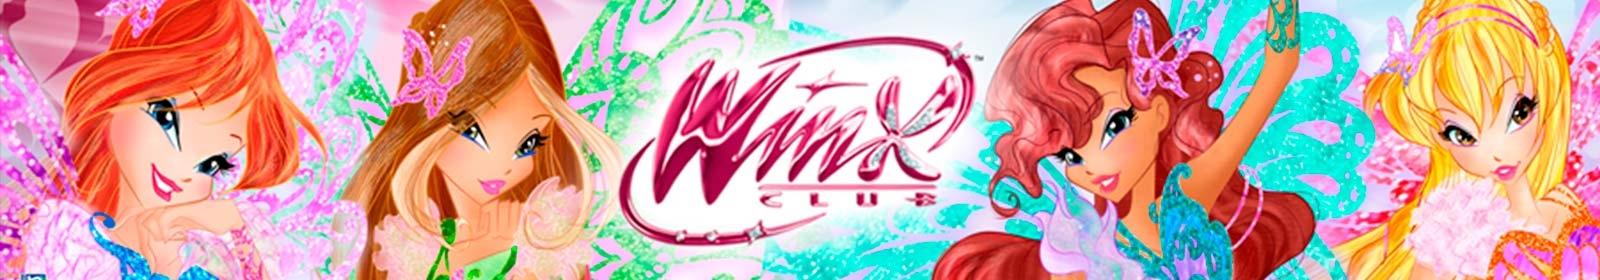 comprar Winx Online